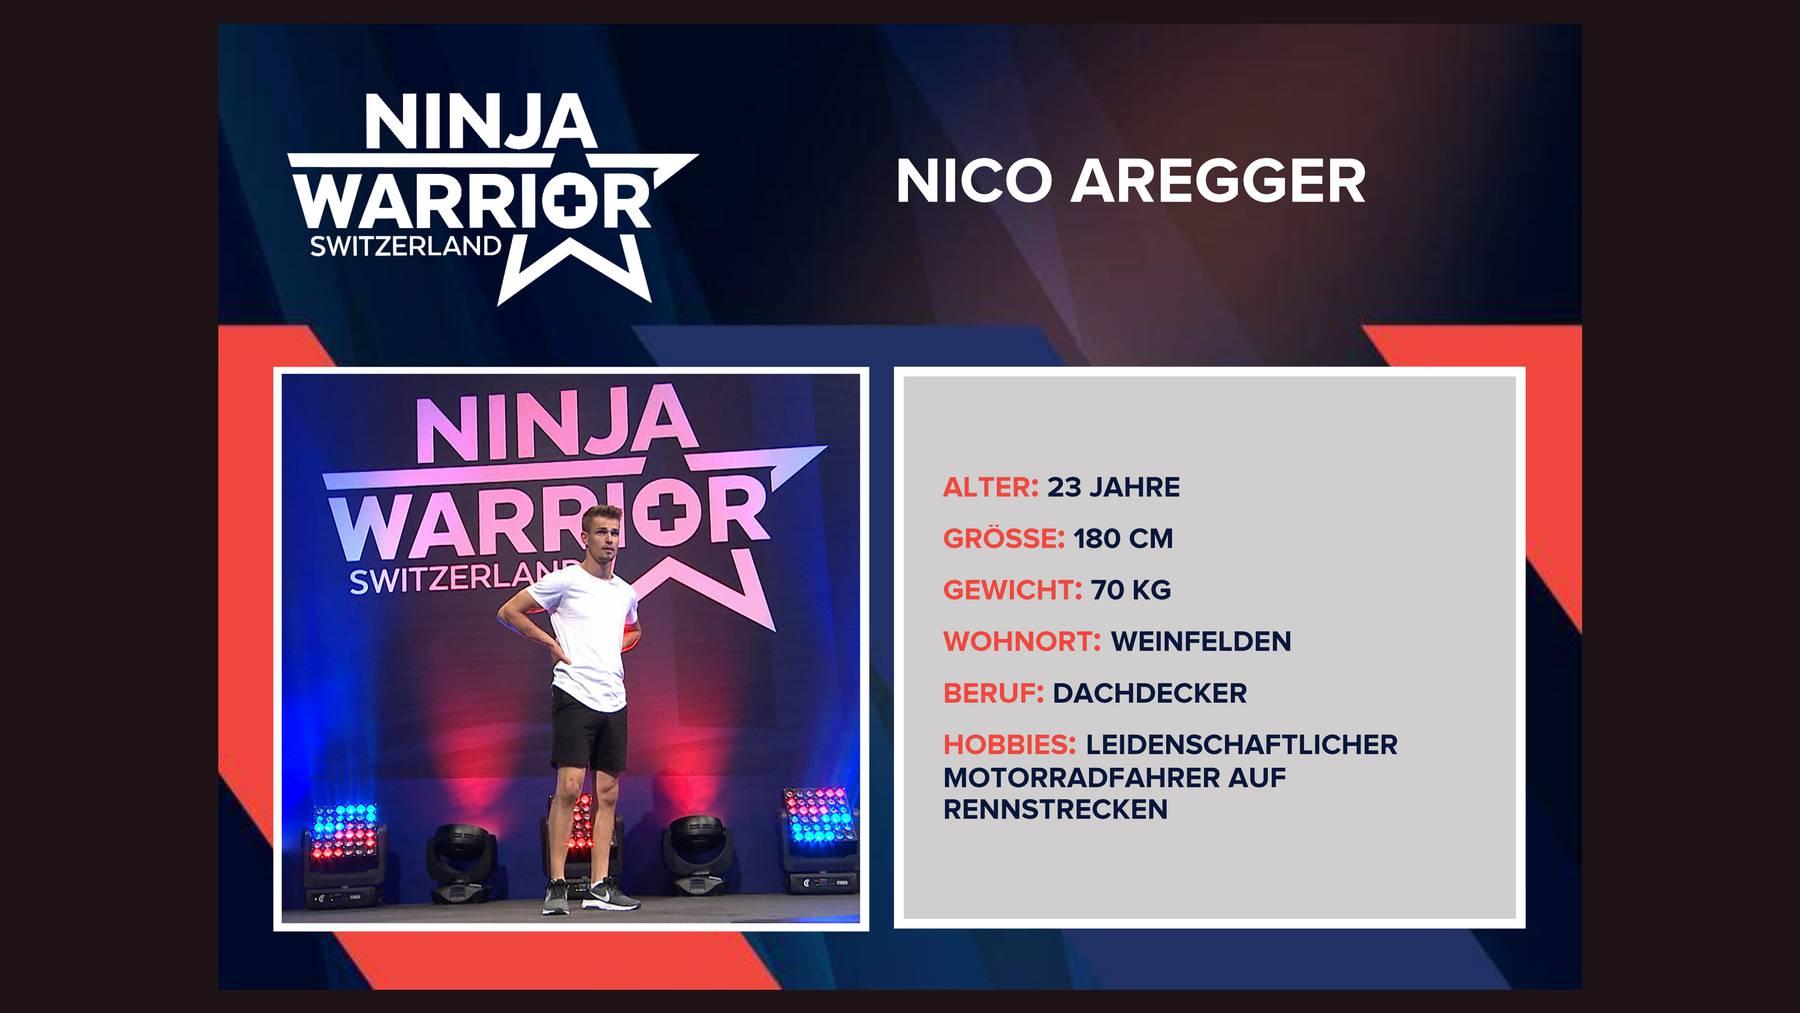 Nico Aregger